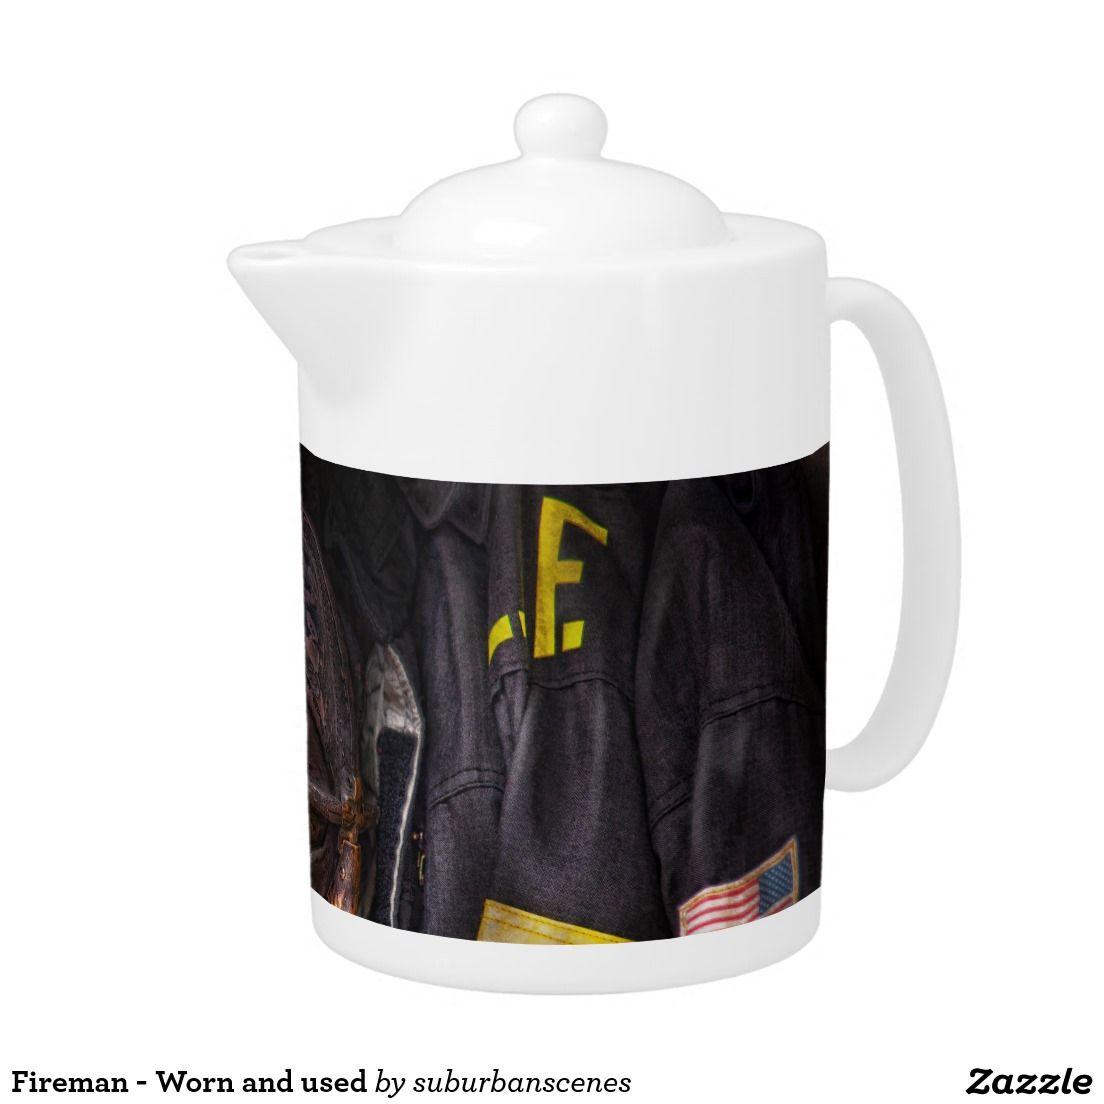 Fireman - Worn and used Teapot